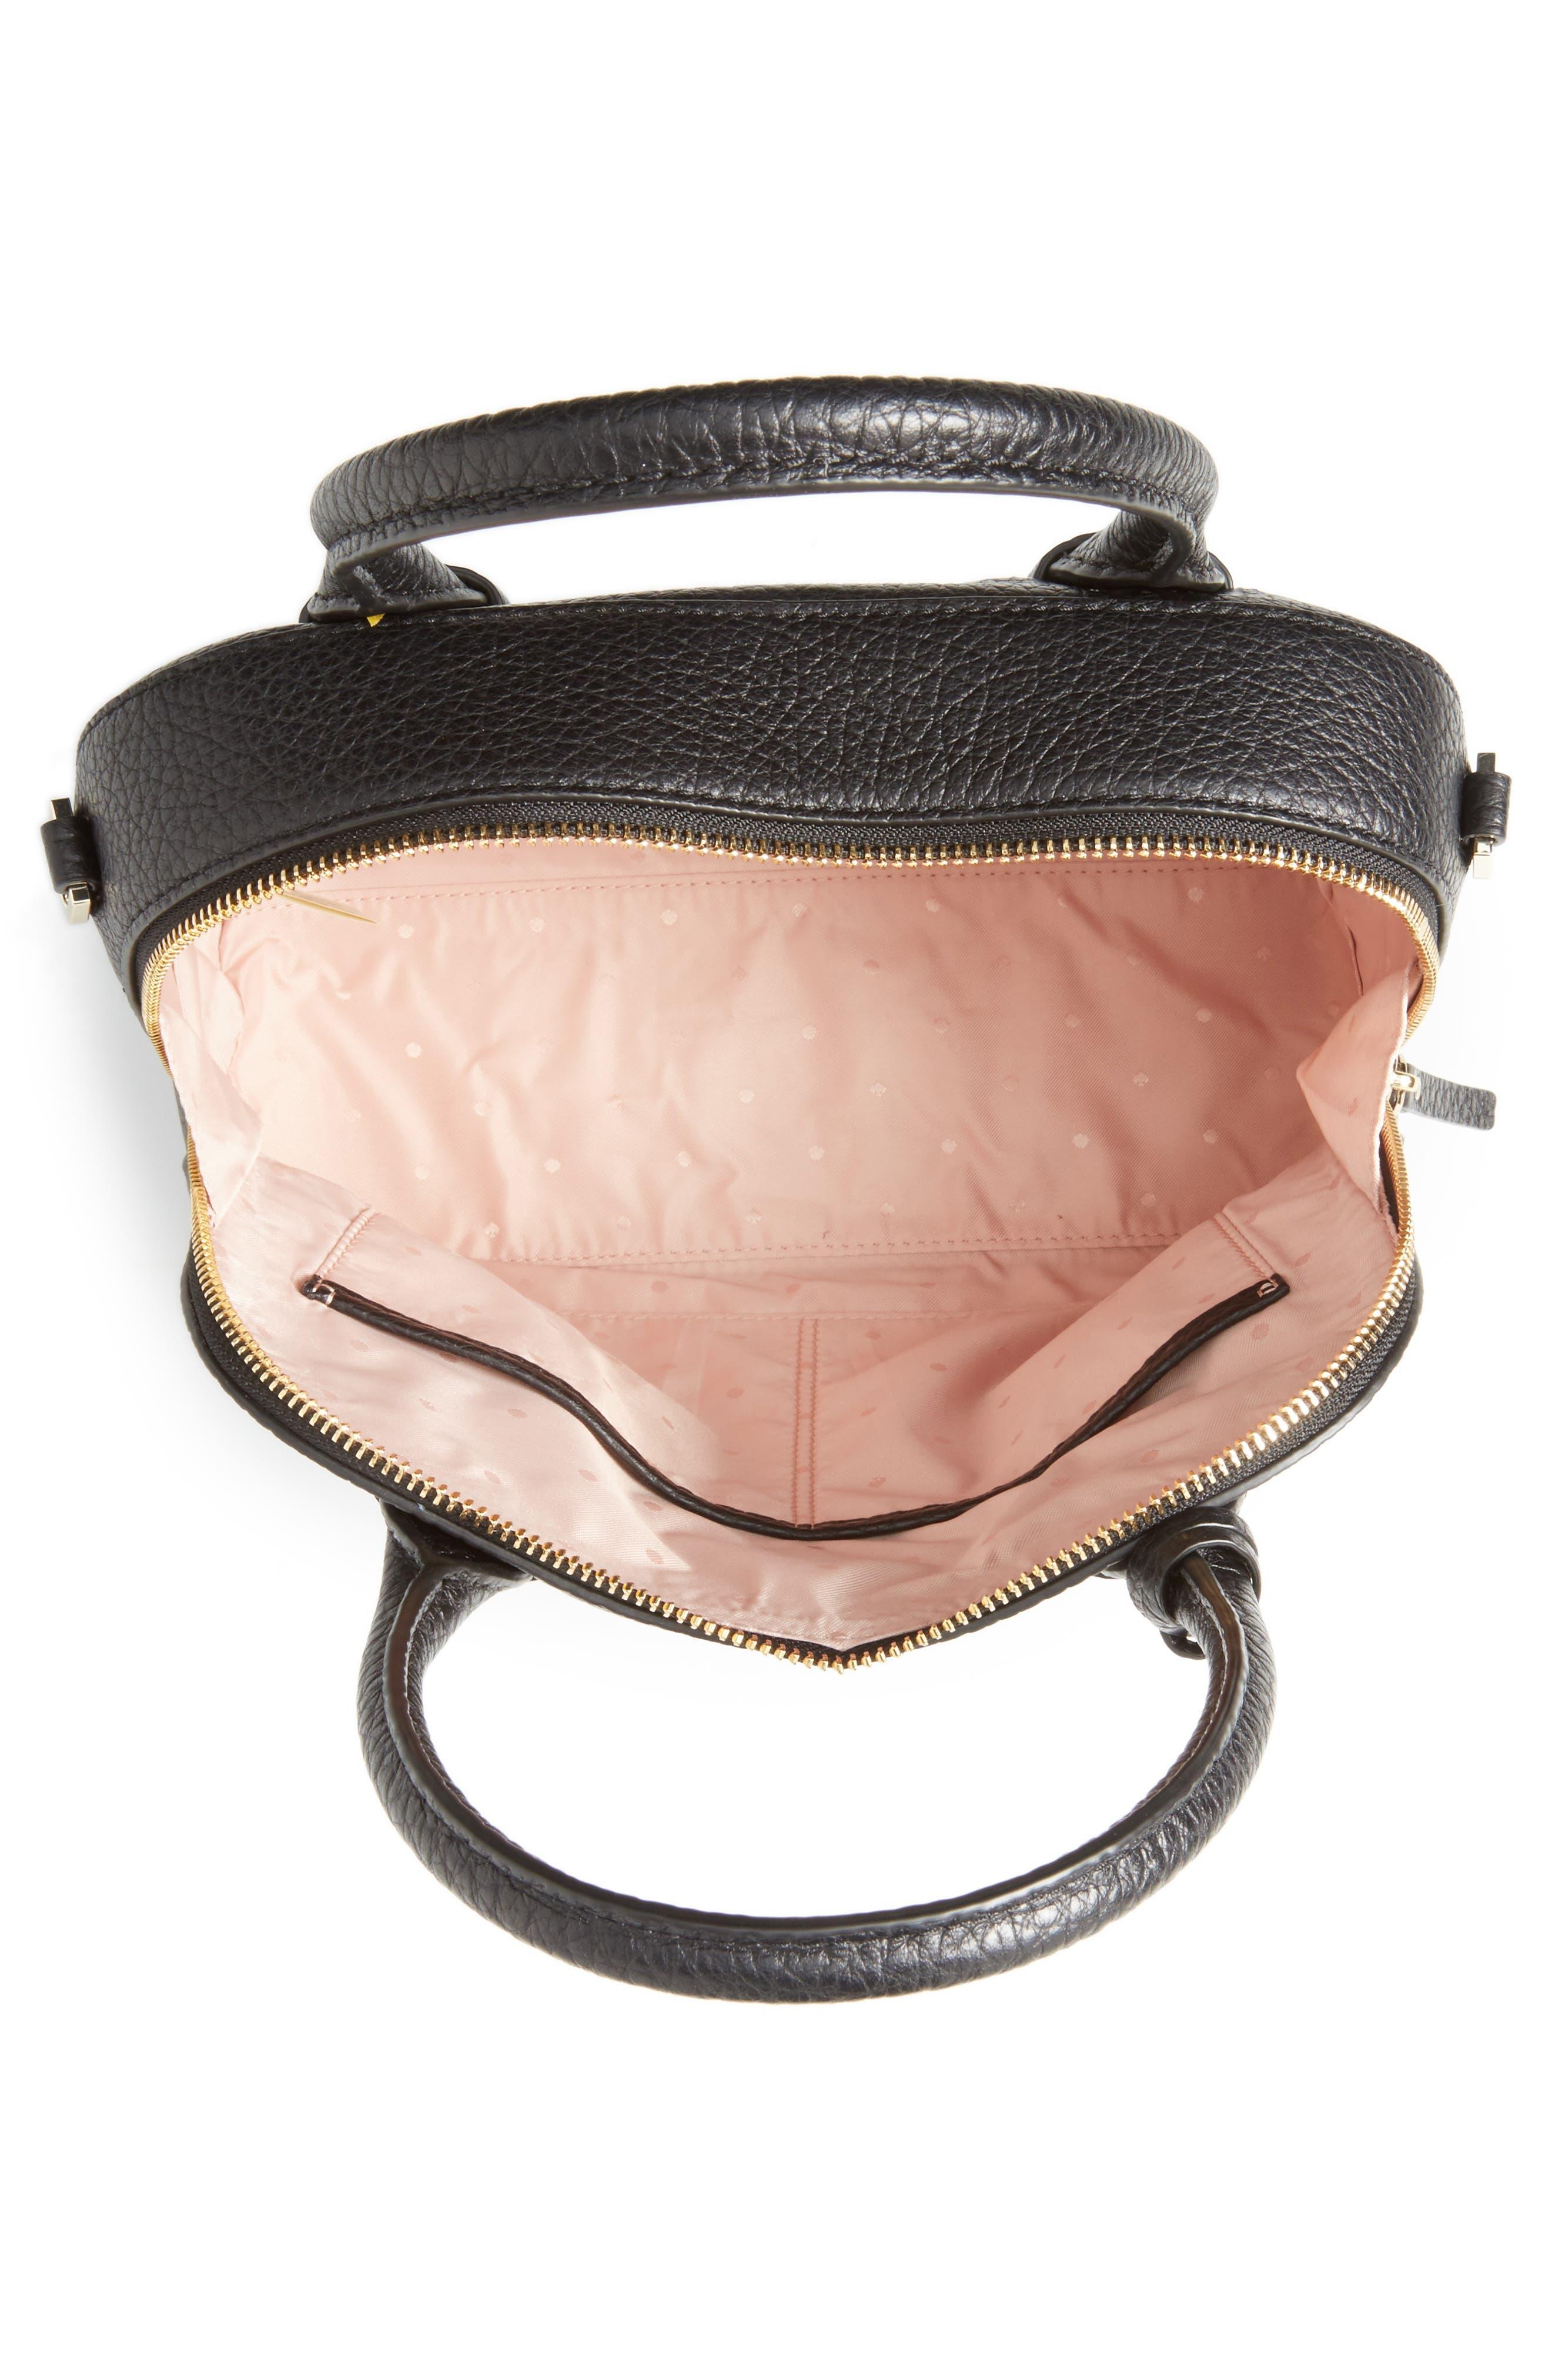 carter street - small ashleigh leather satchel,                             Alternate thumbnail 4, color,                             001